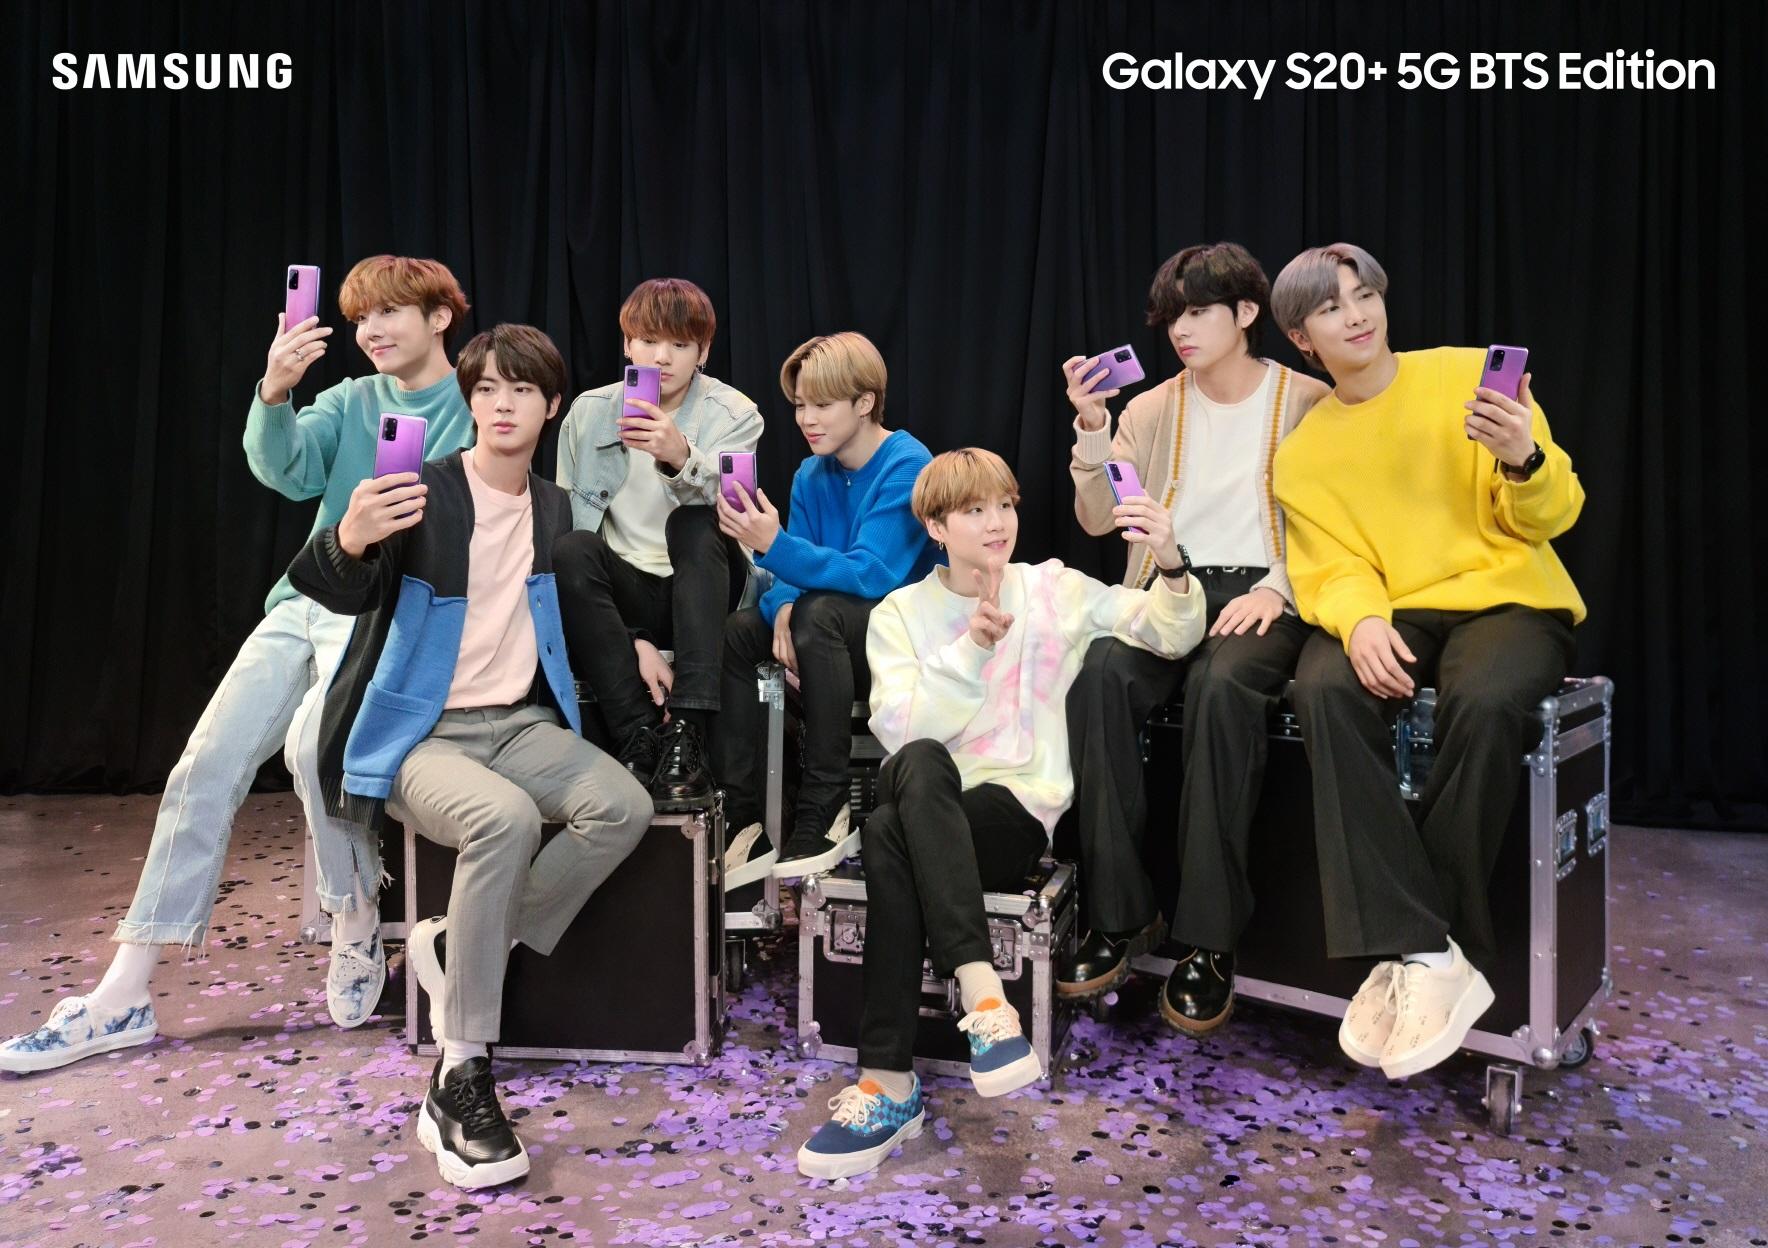 1】Galaxy S20+5G與Galaxy Buds+BTS Edition以BTS及粉絲為靈感,為裝置注入令人耳目一新的設計